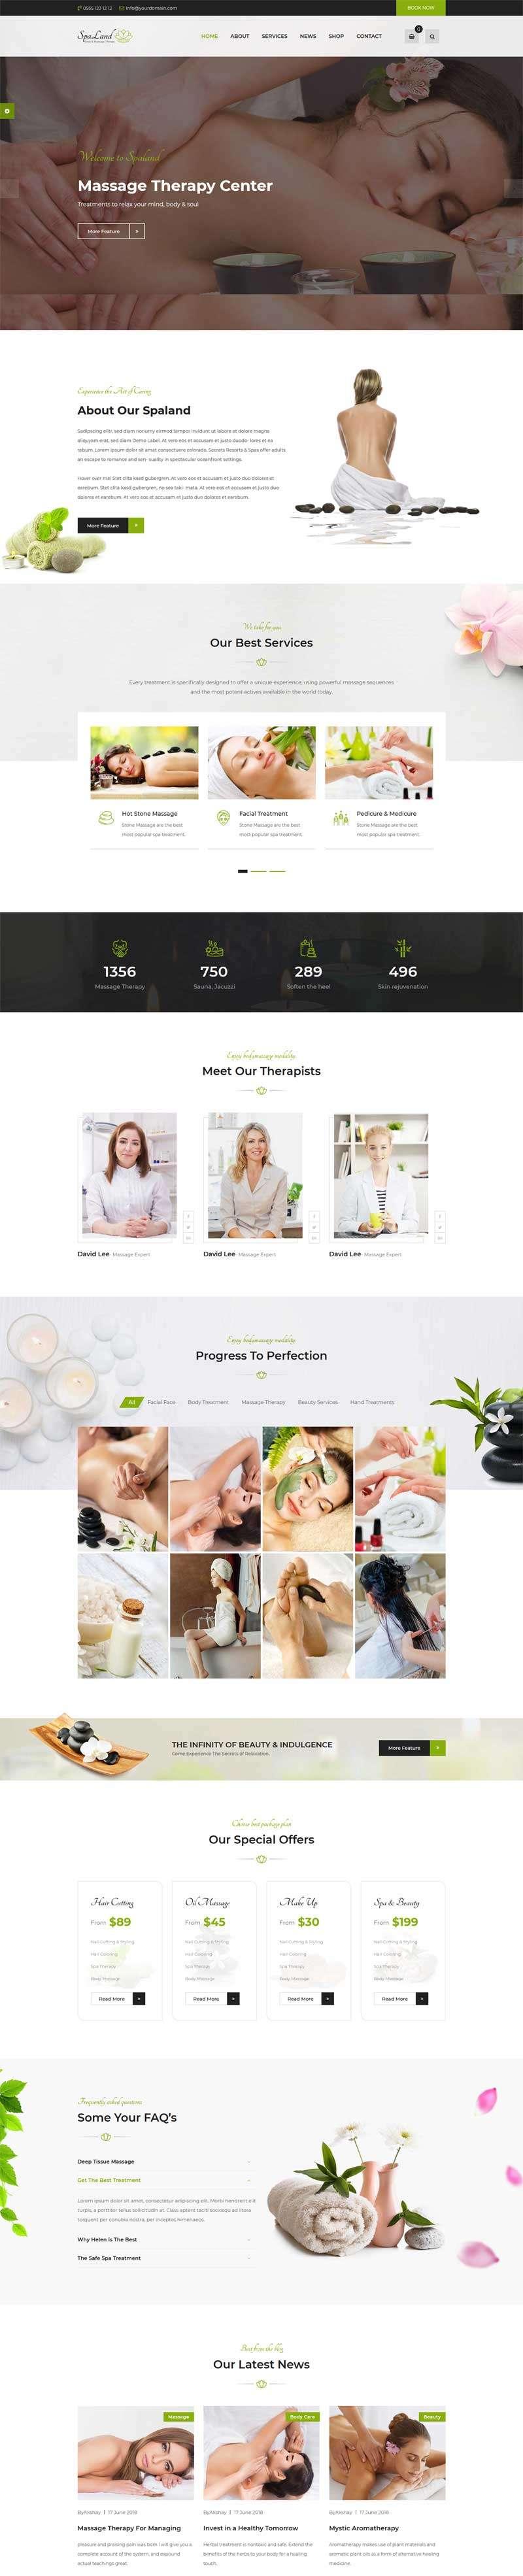 女性spa美容养生会所网站bootstrap模板